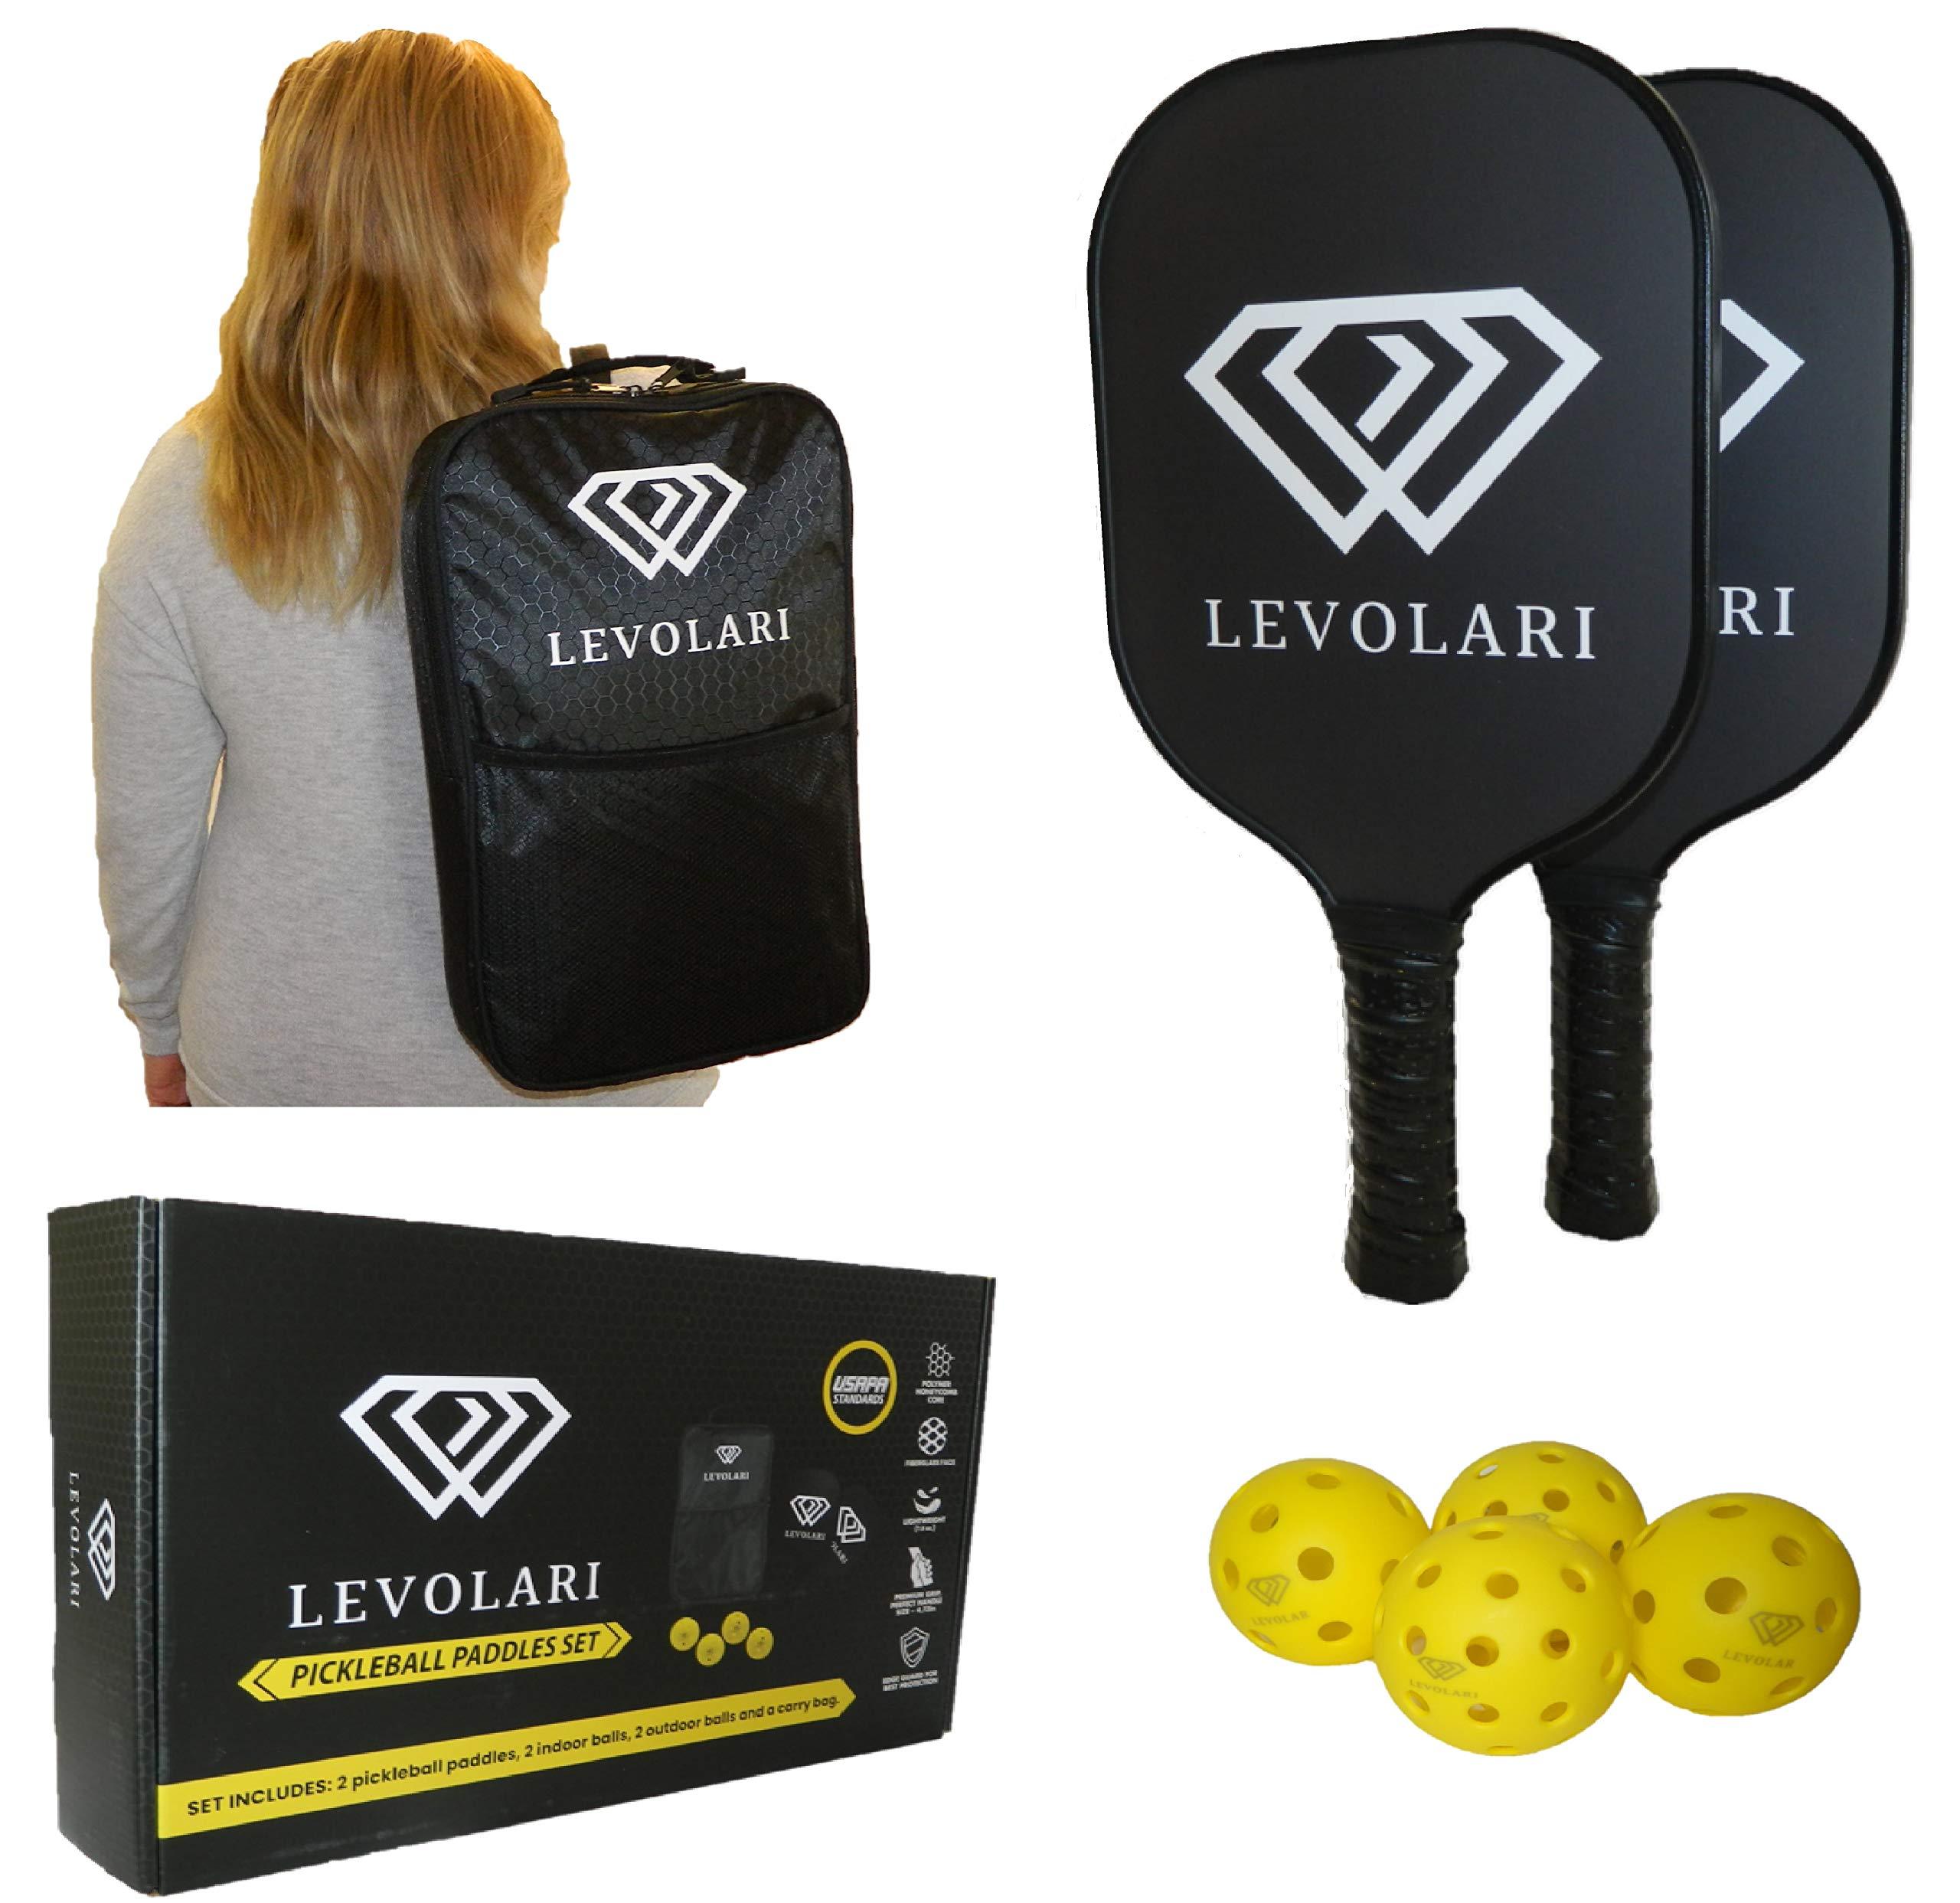 Levolari Pickleball Paddle Set – Includes 2 Pickleball Racke